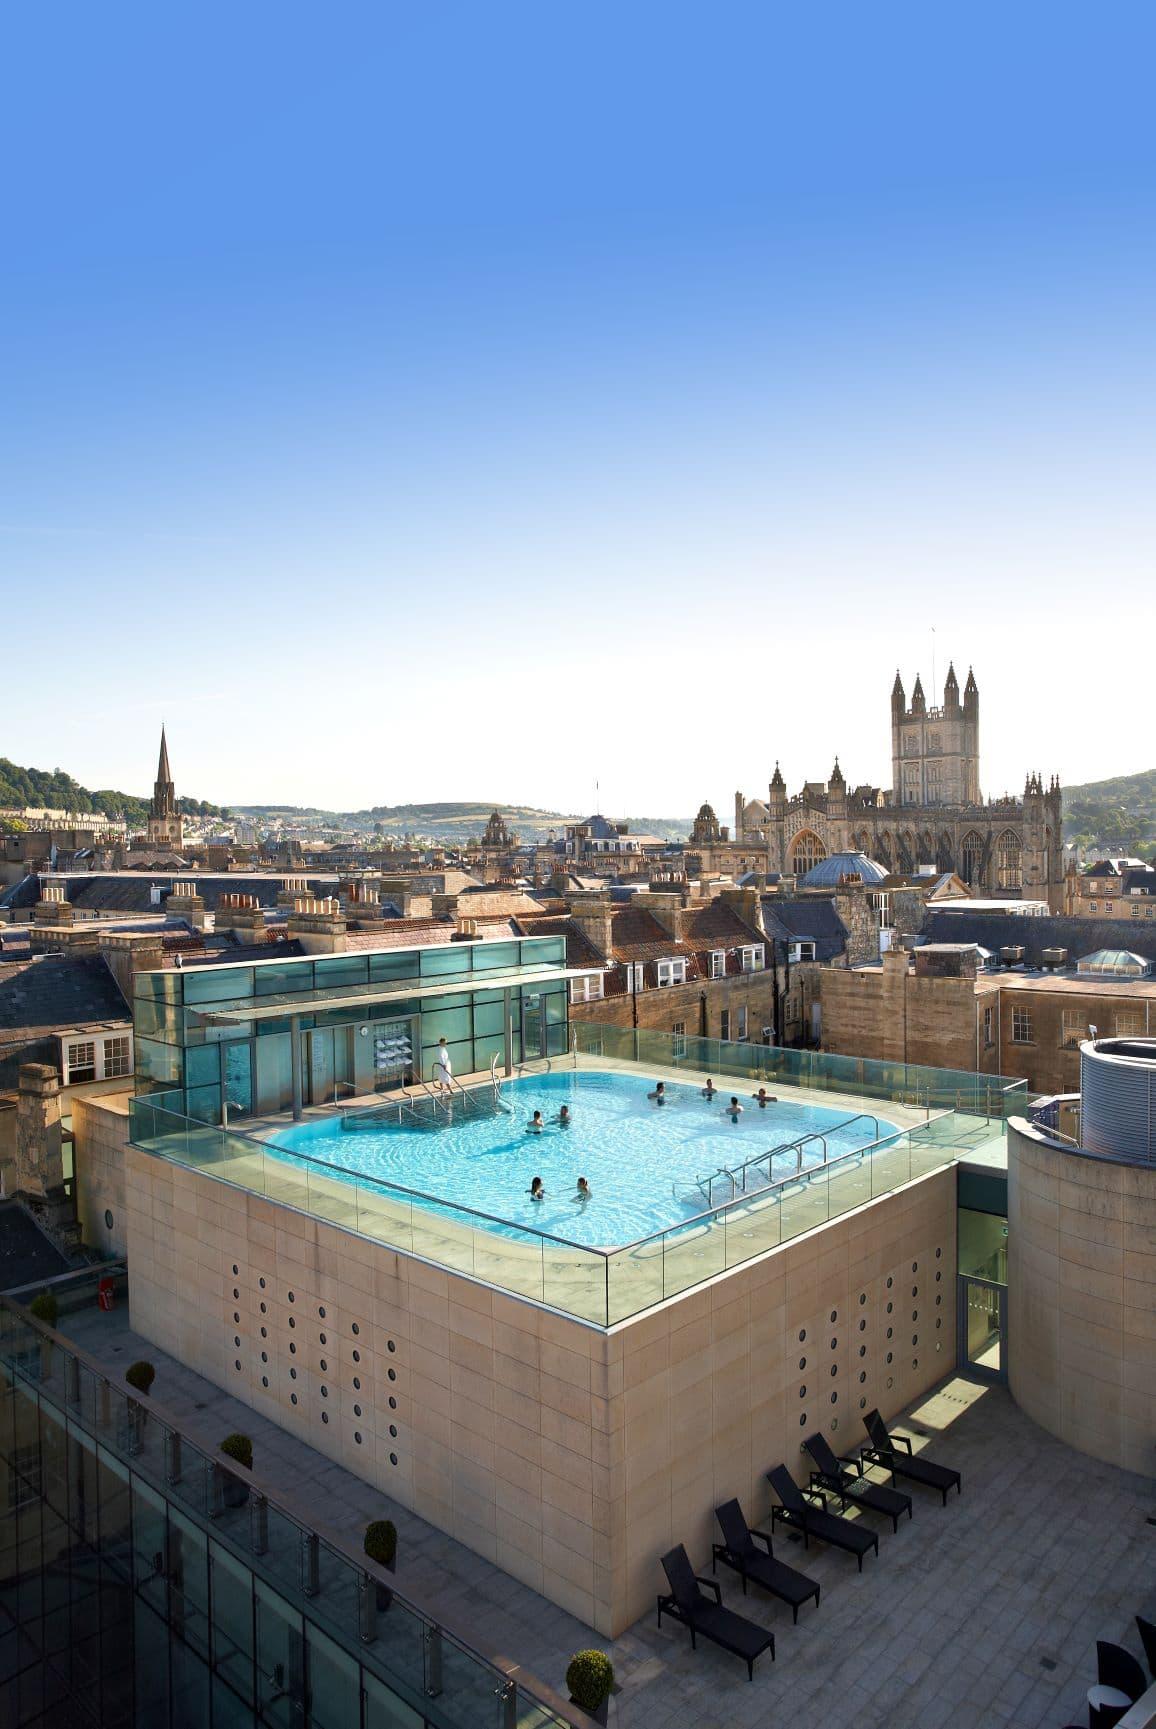 Badekultur Thermae Bath Spa in Bath, Großbritannien